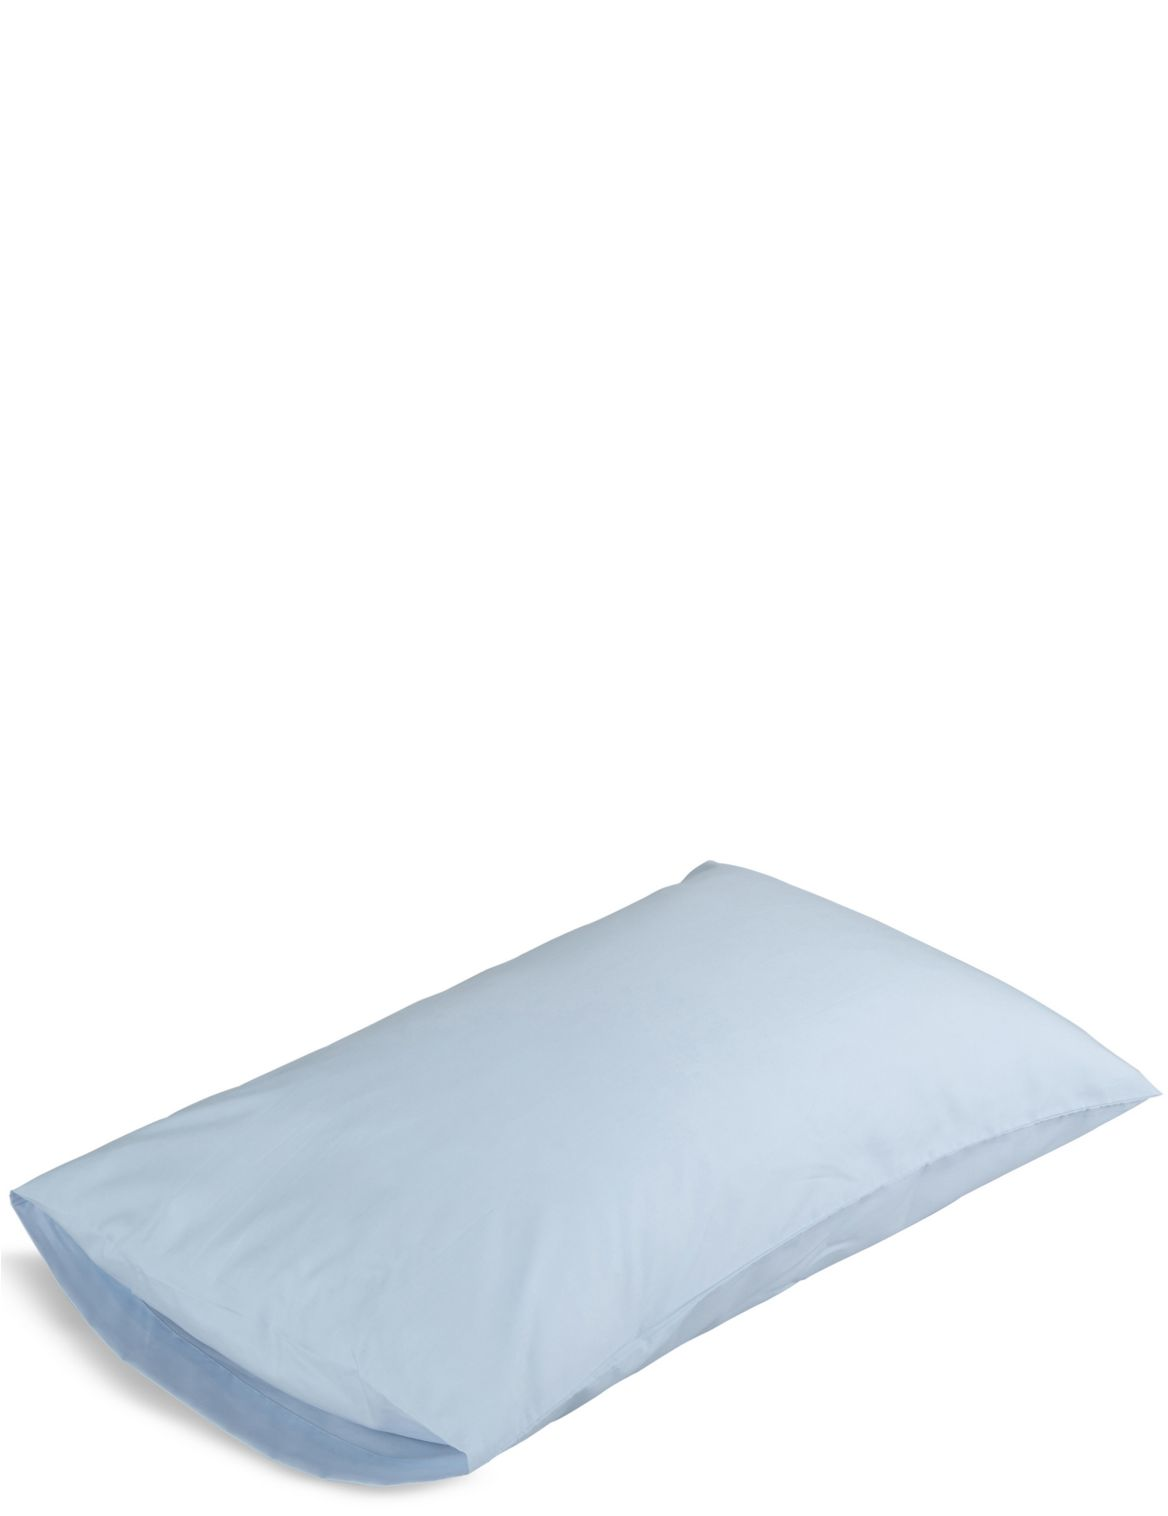 Comfortably Cool Standard Pillowcase Blue